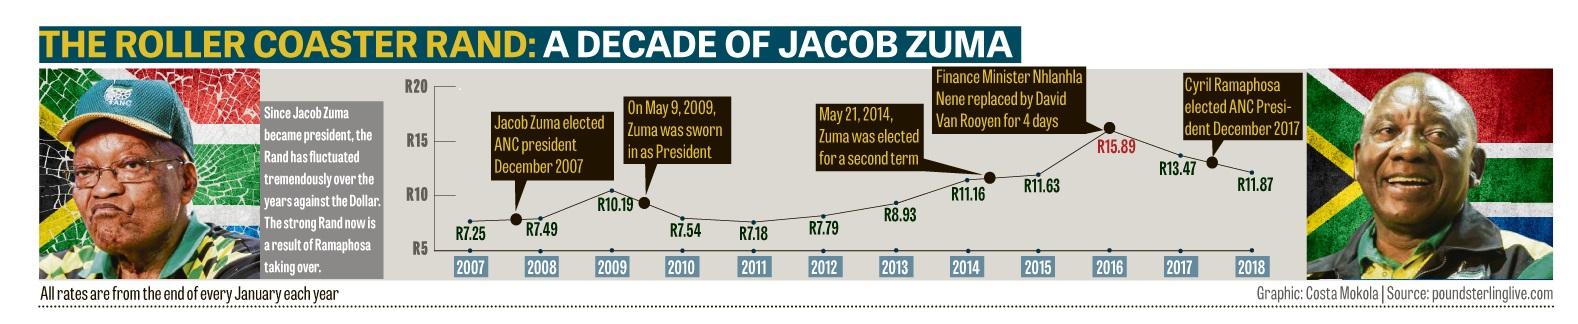 Infographic: Costa Makola.